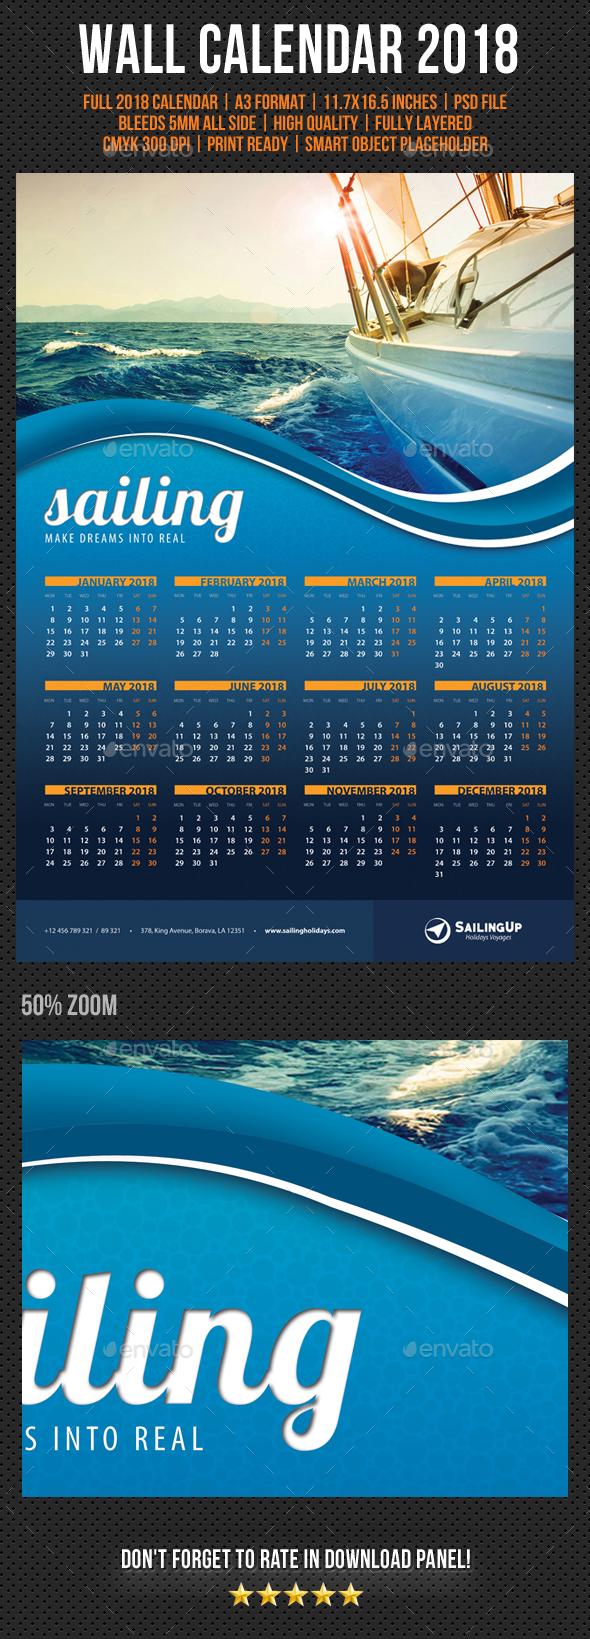 Wall Calendar A3 2018 V01